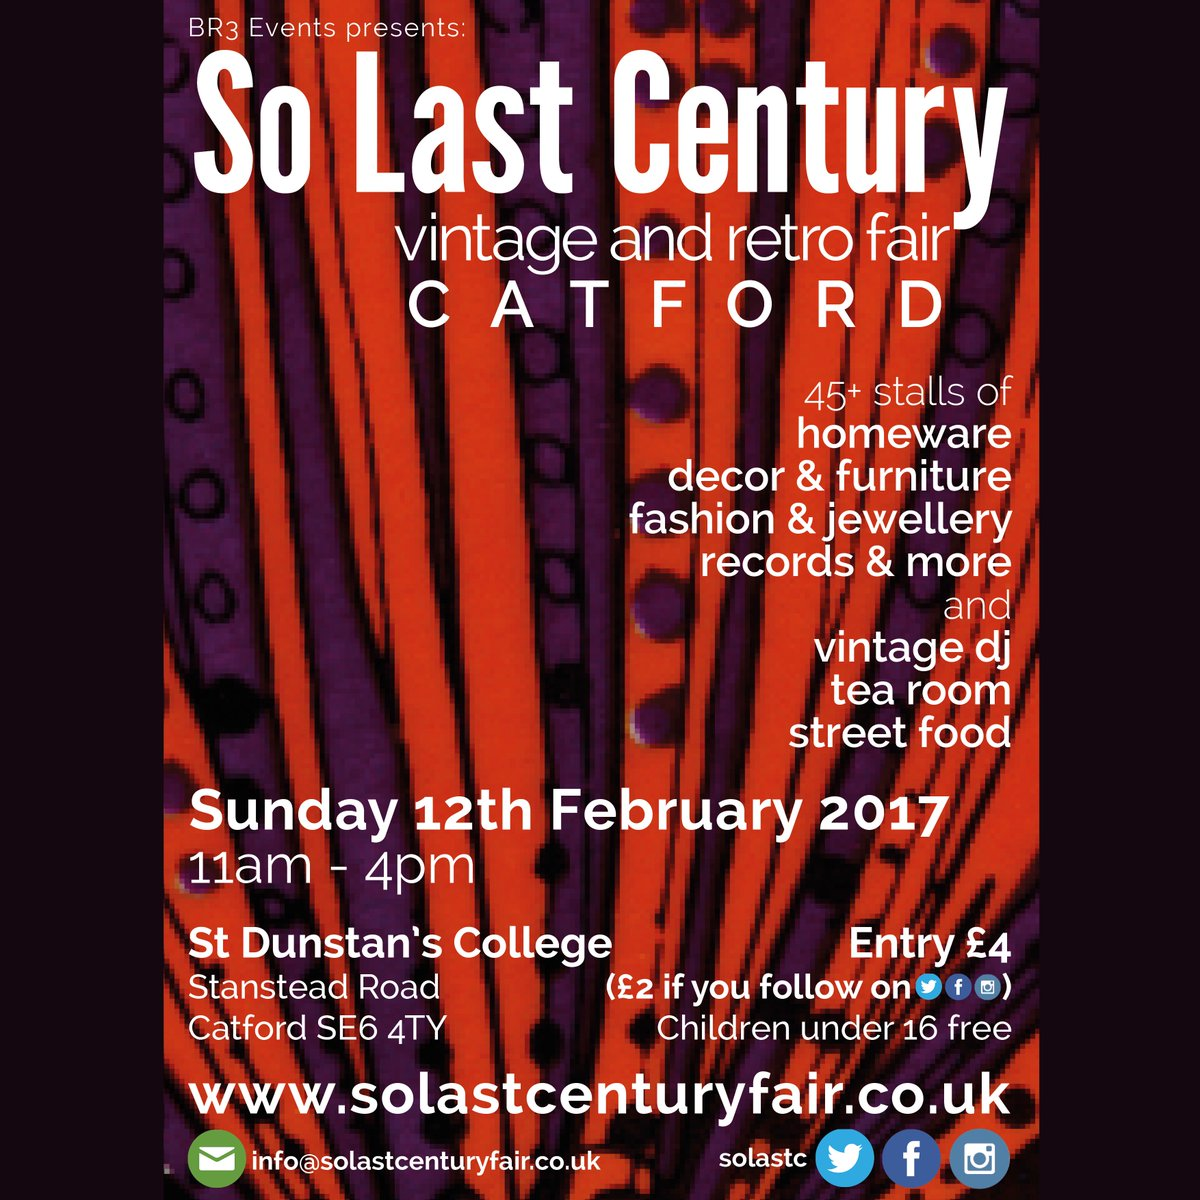 So last century poster